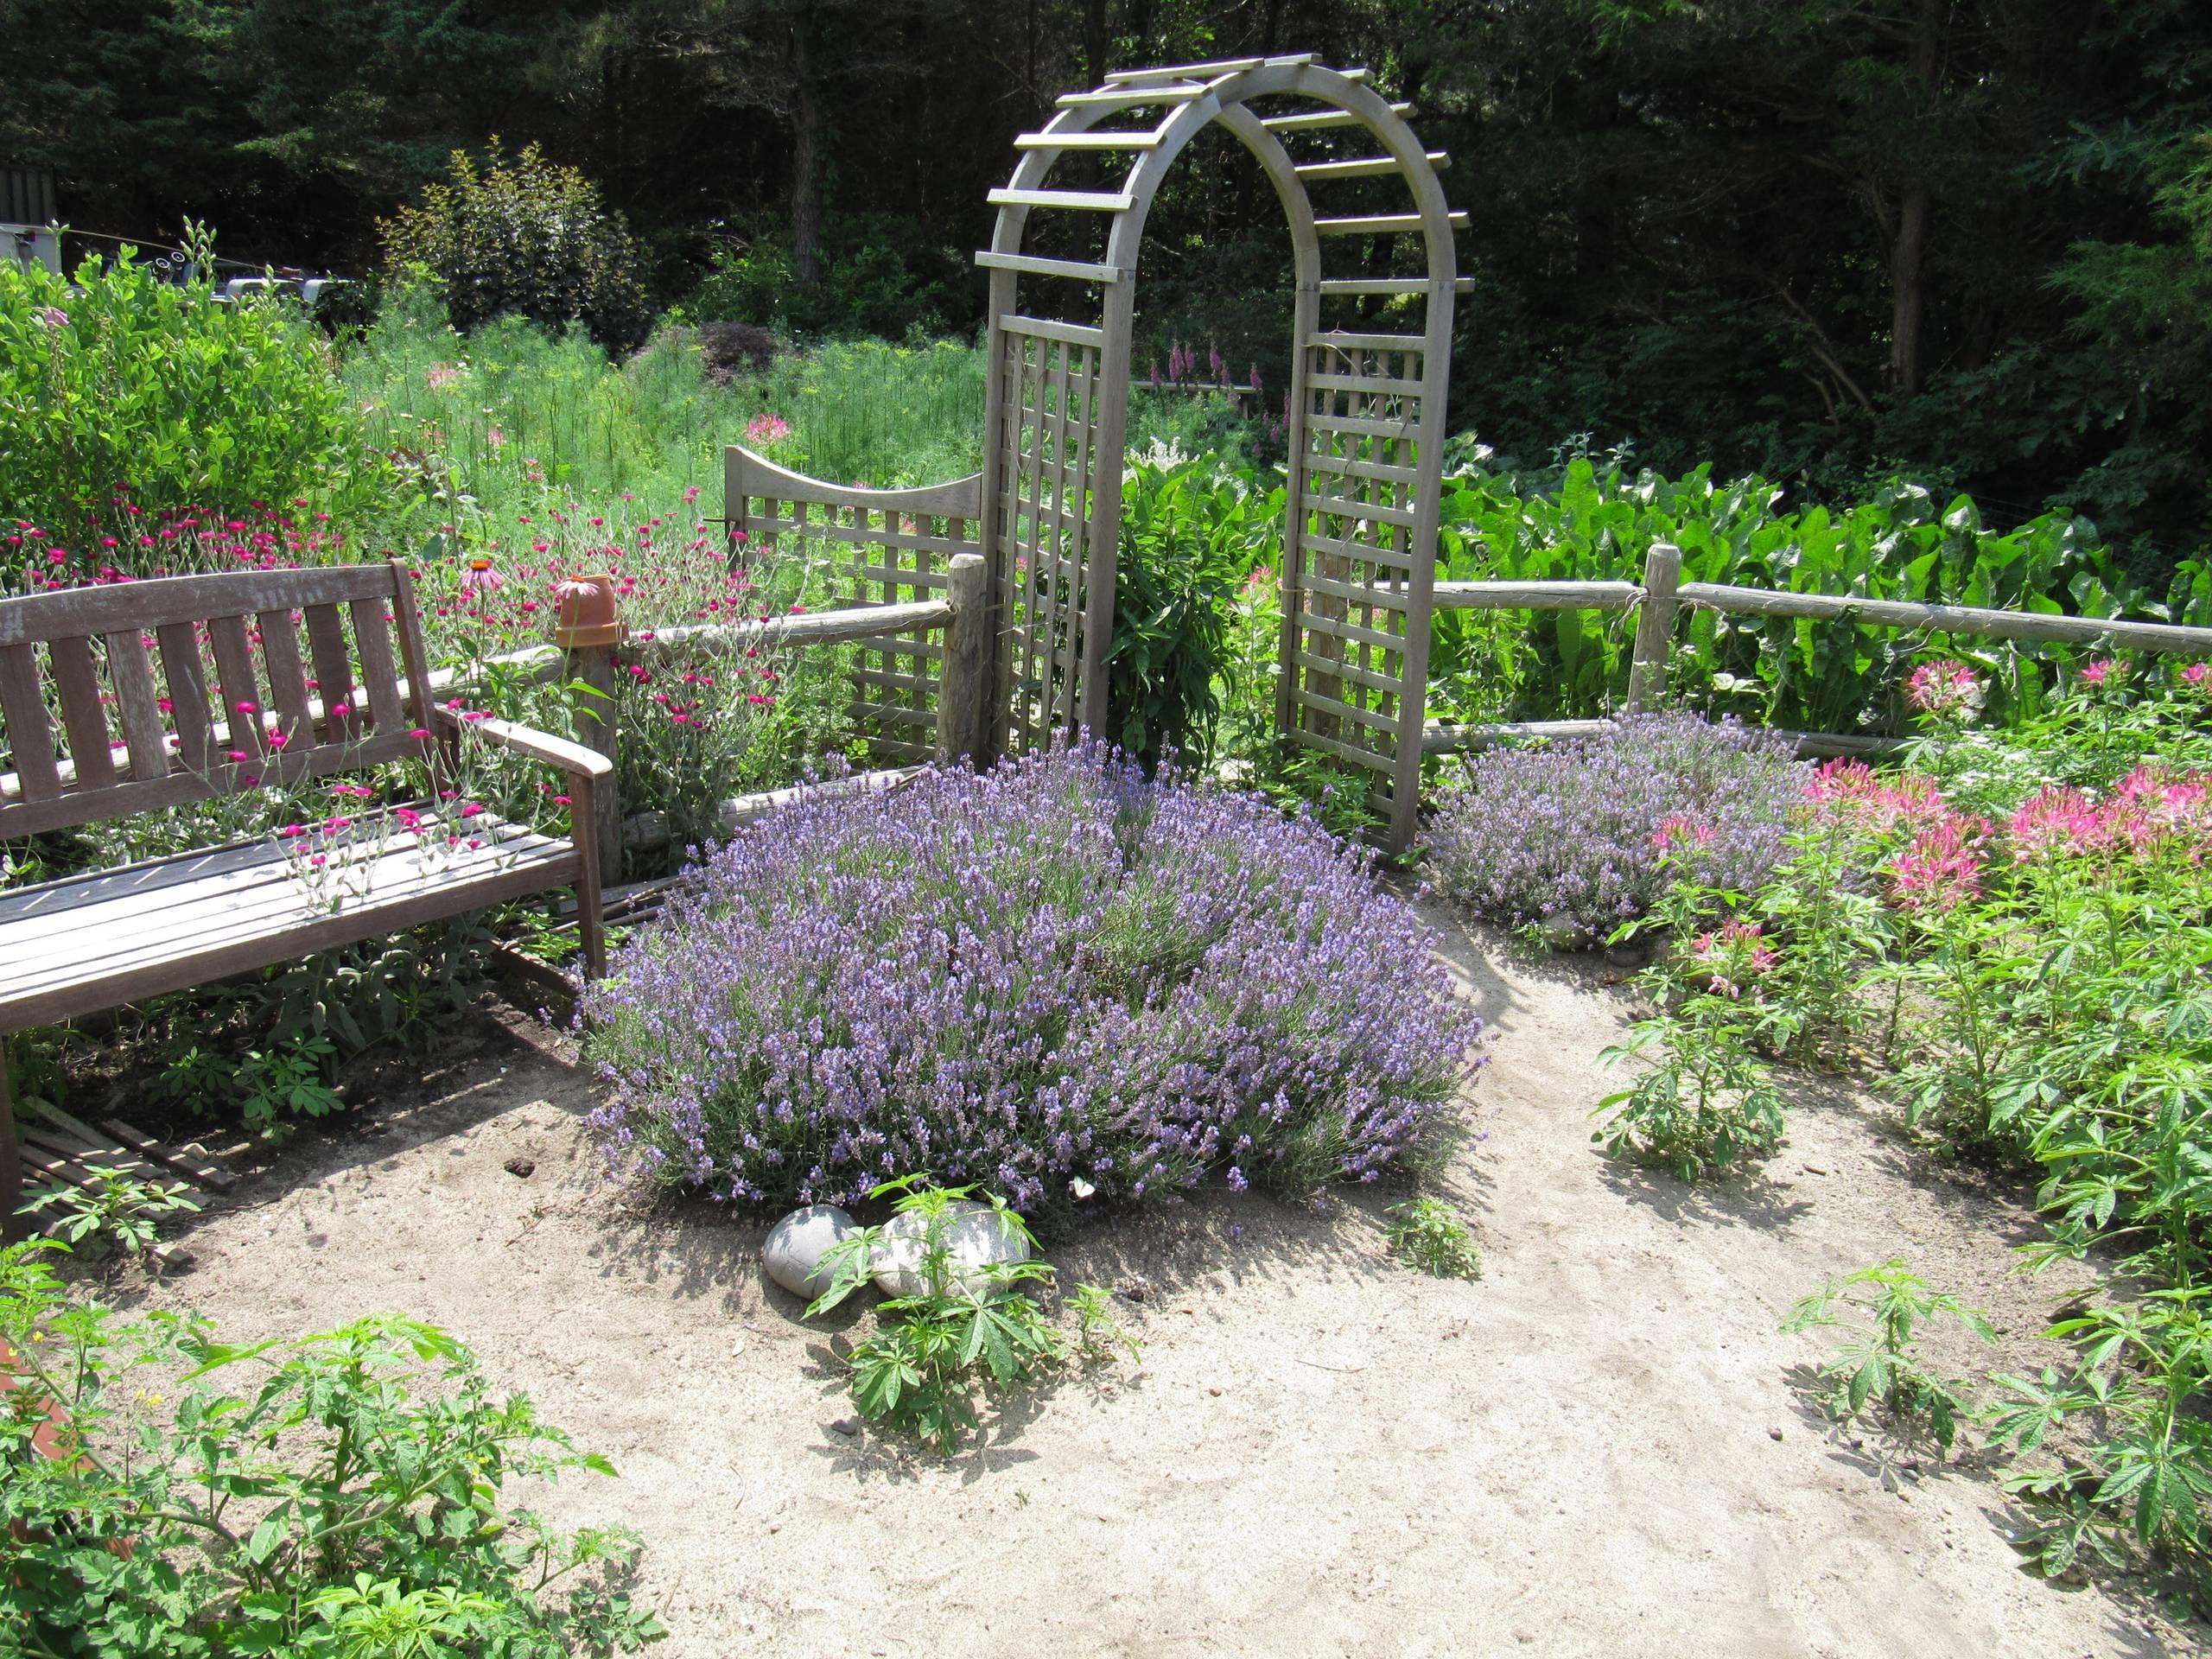 Littlefield Farm : My Garden